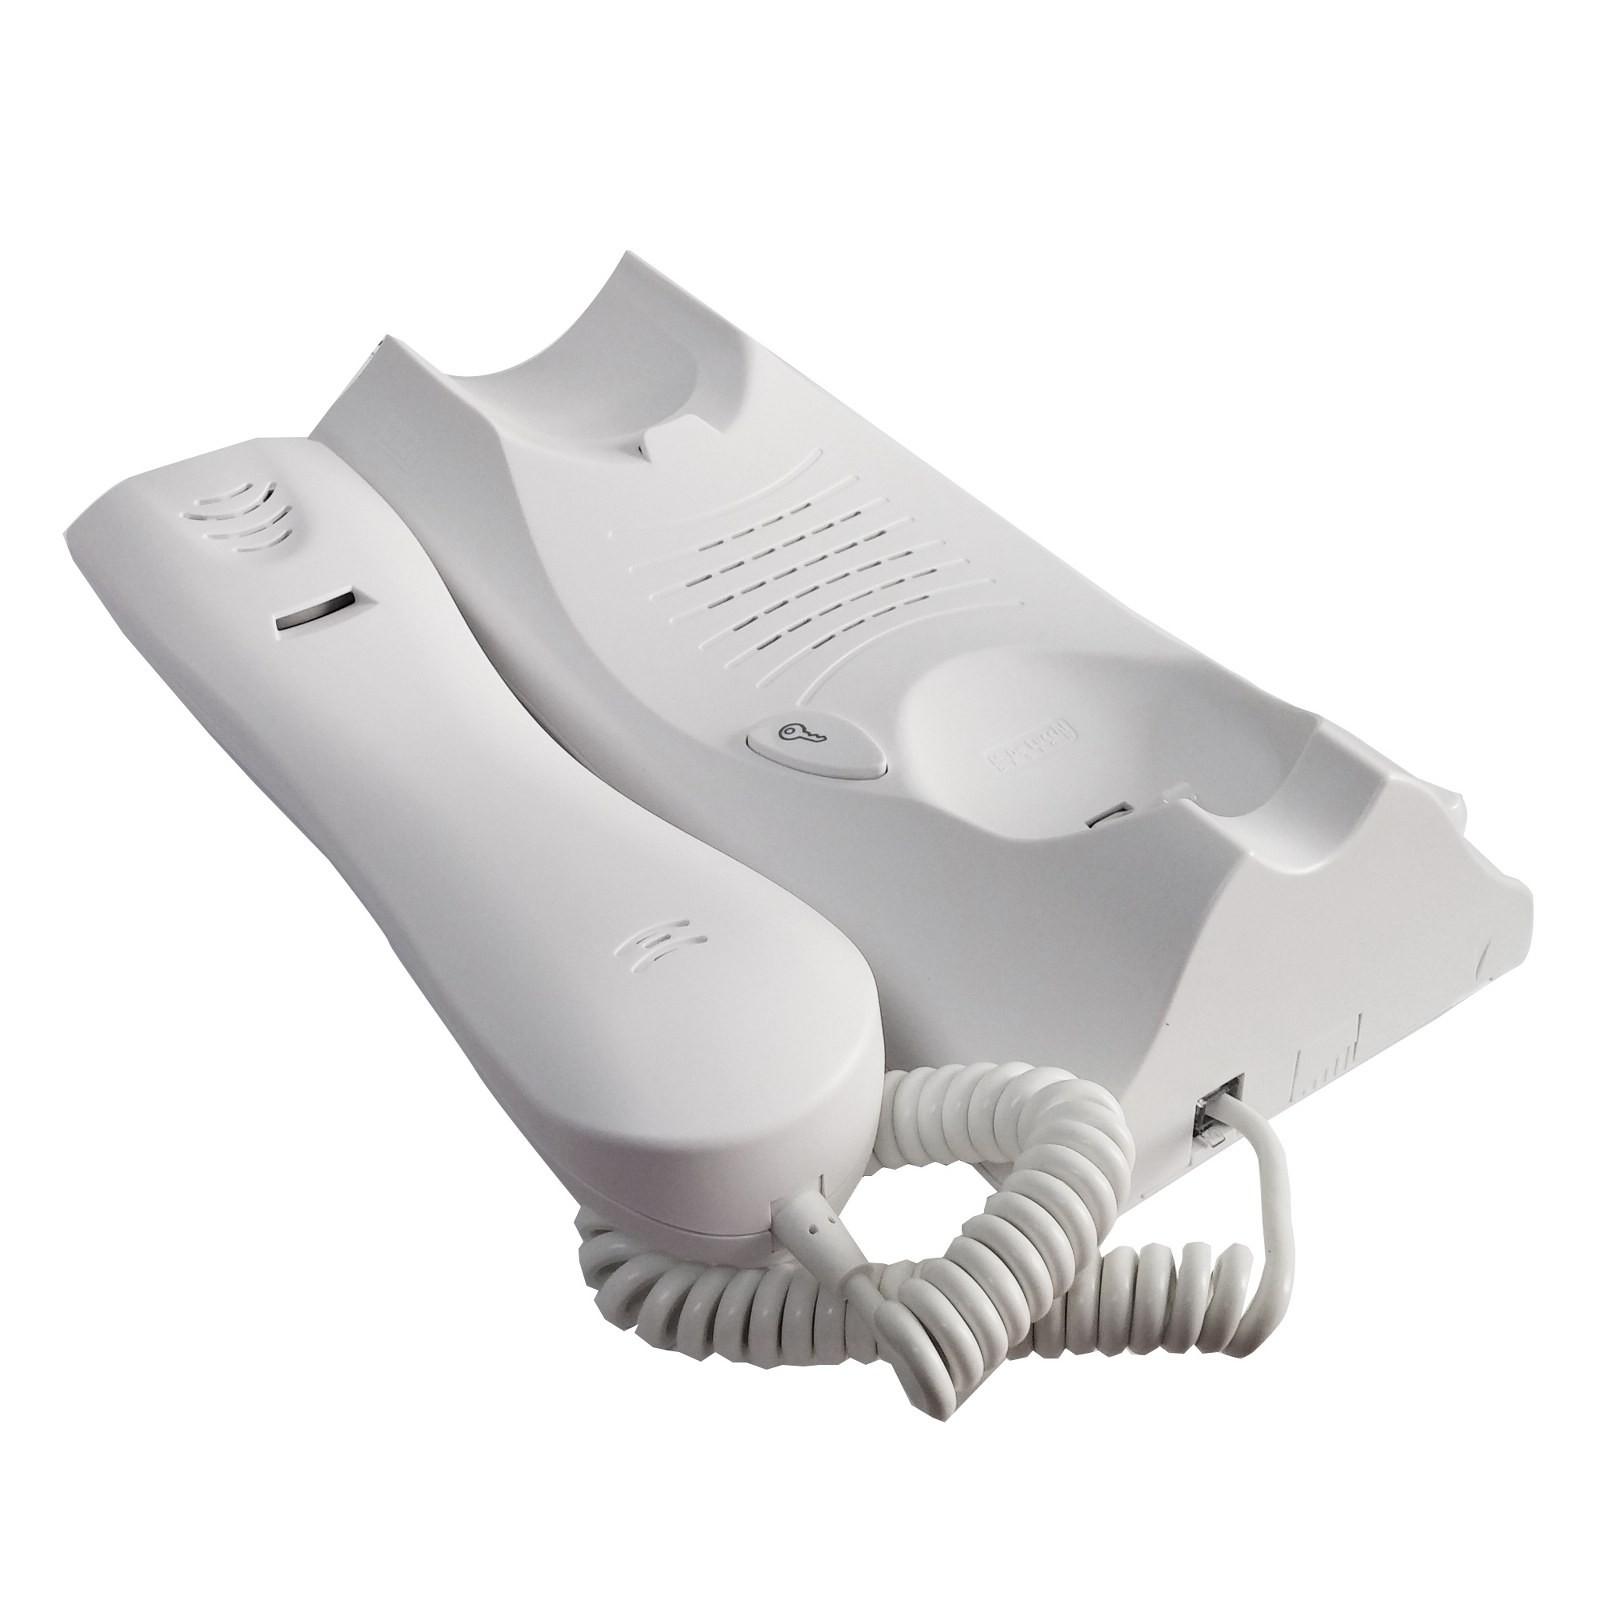 Kit citofono monofamiliare cornetta interno mikra atlantico urmet audio 4 fili area illumina for Citofono elettronico urmet atlantico schema